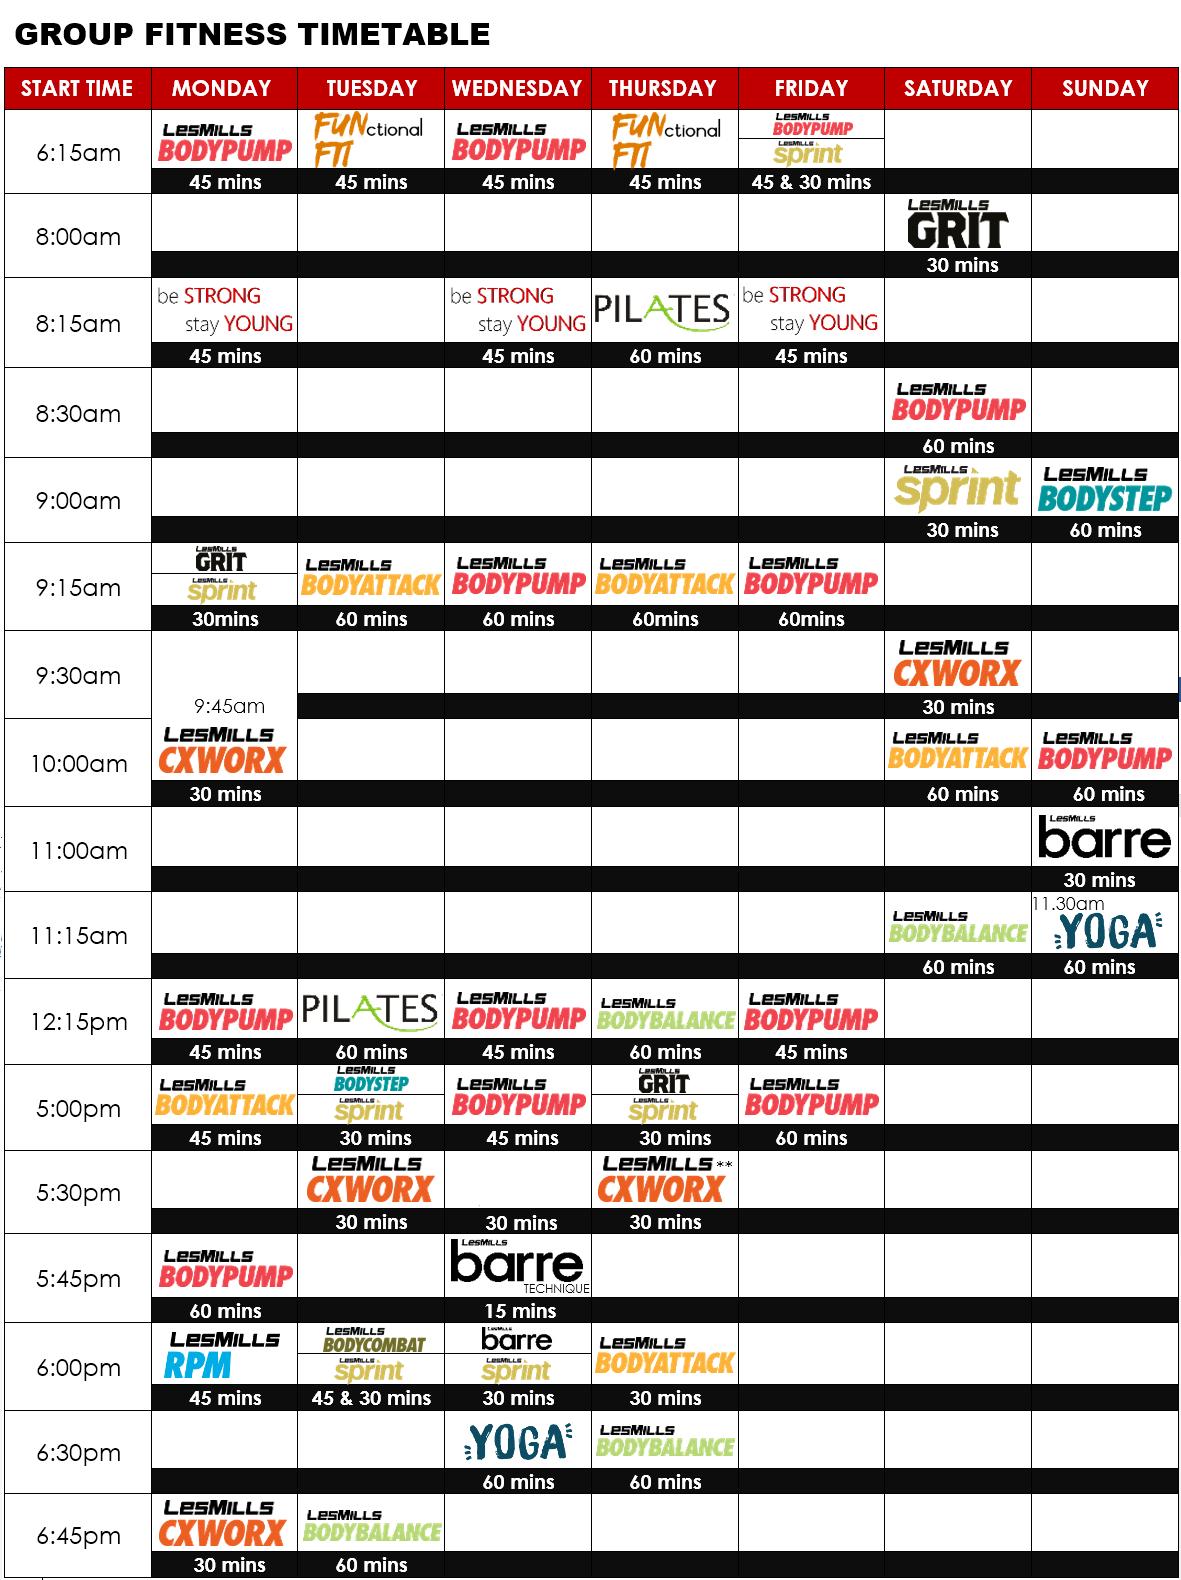 Nightcliff Gym Timetable